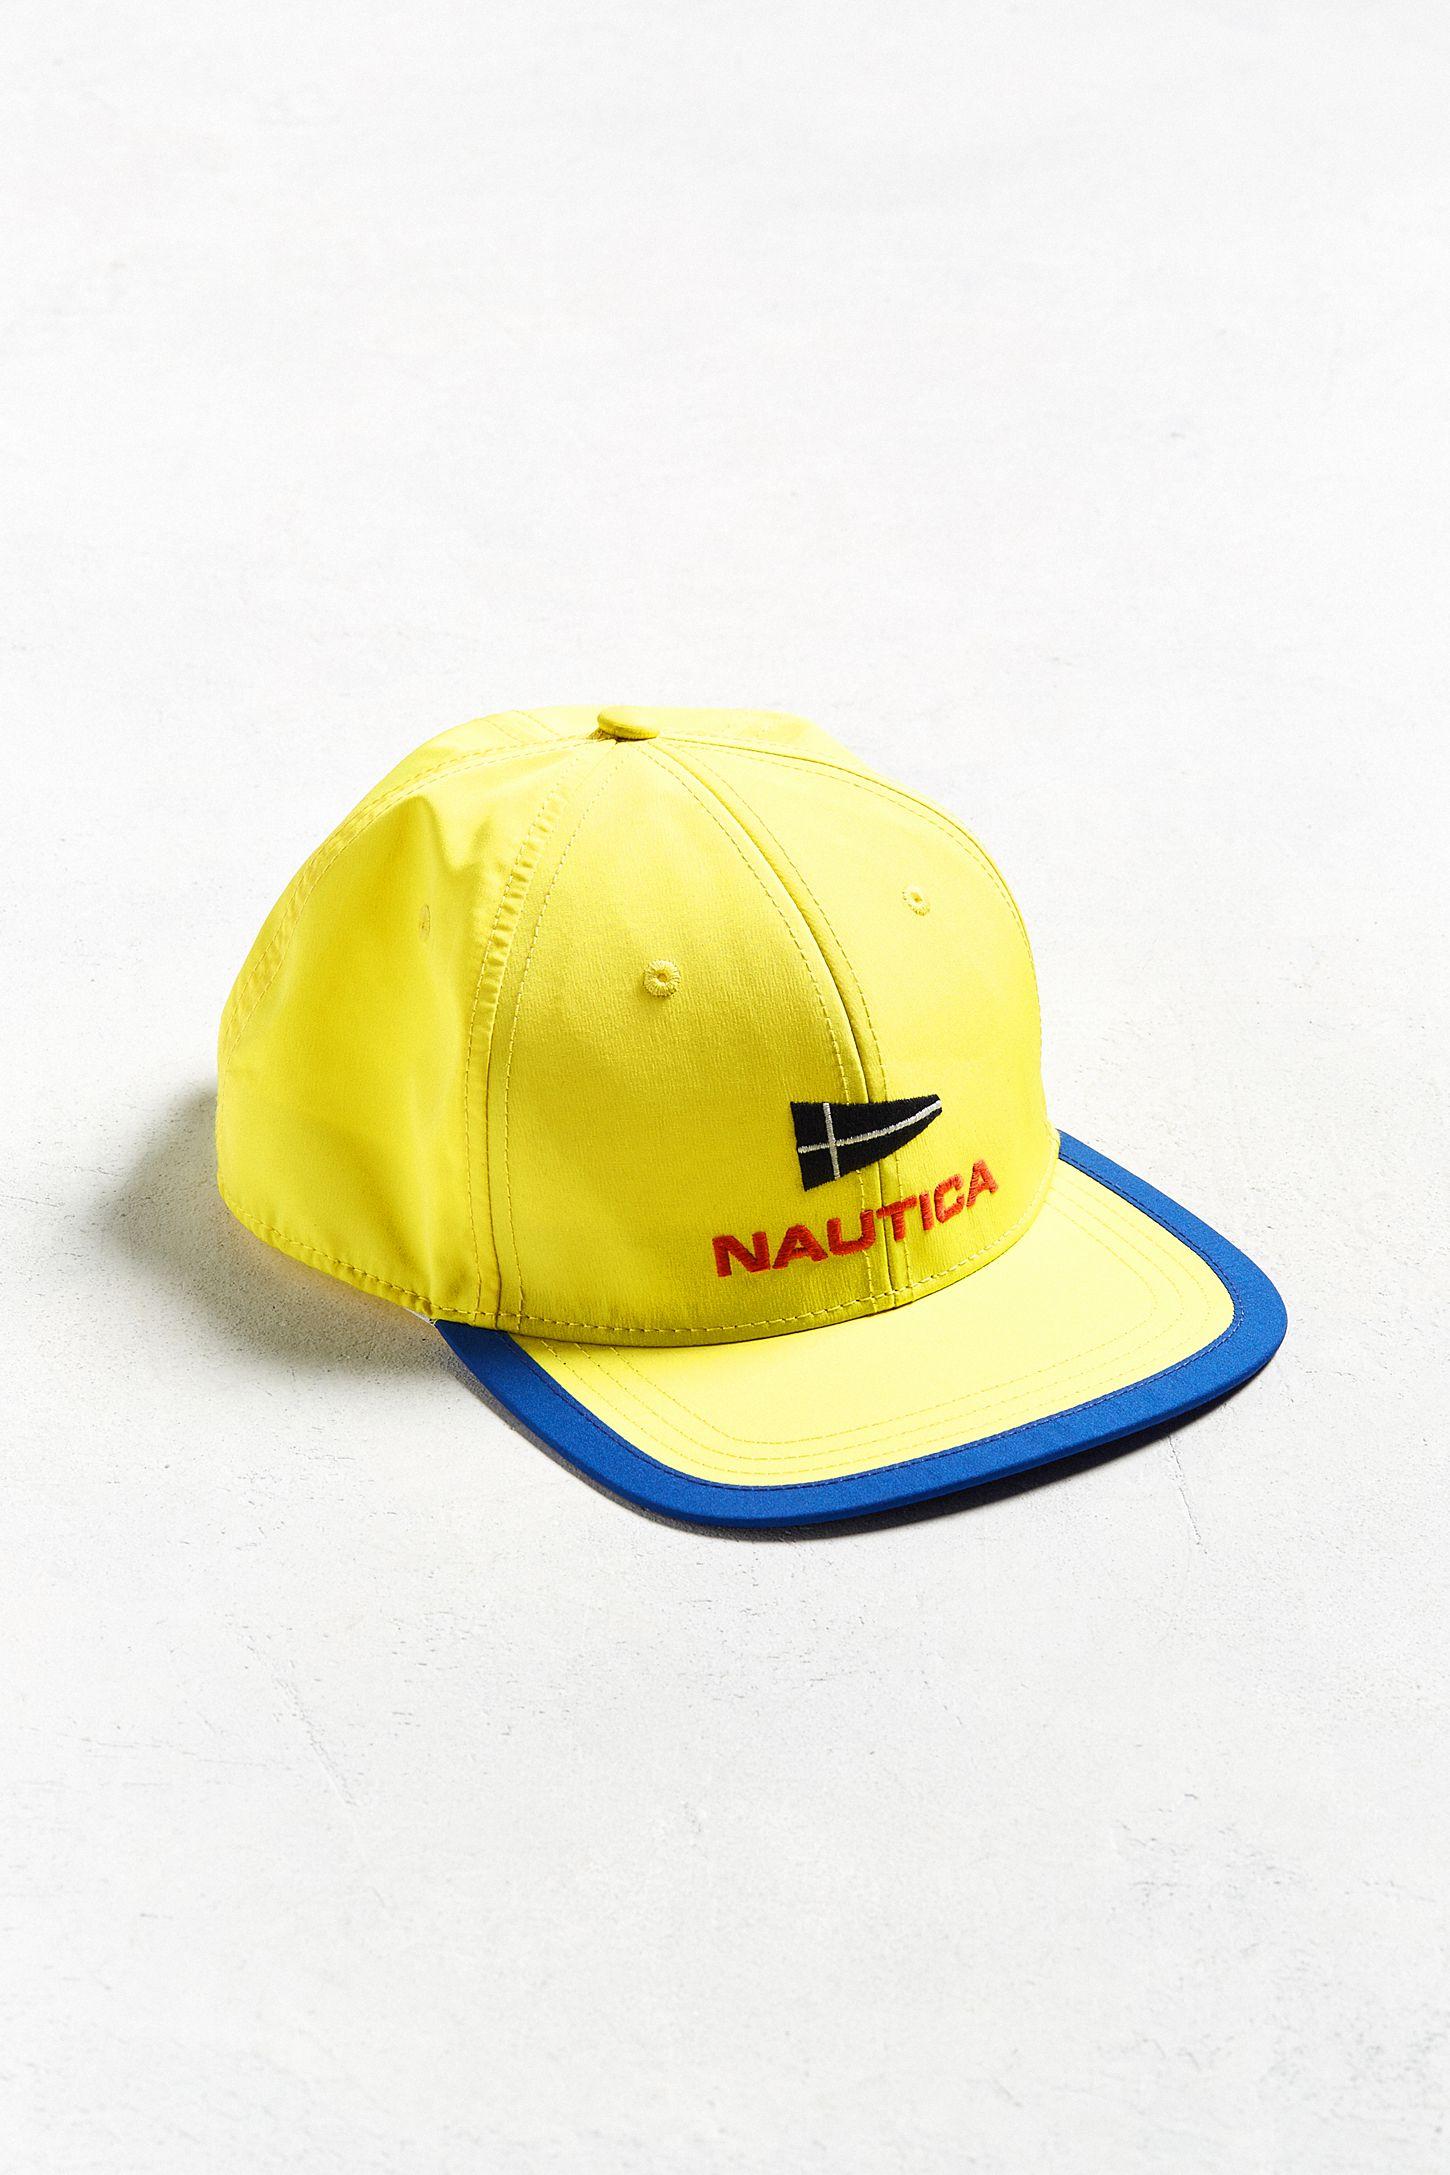 Nautica Baseball Hat  24bbf29a6f4